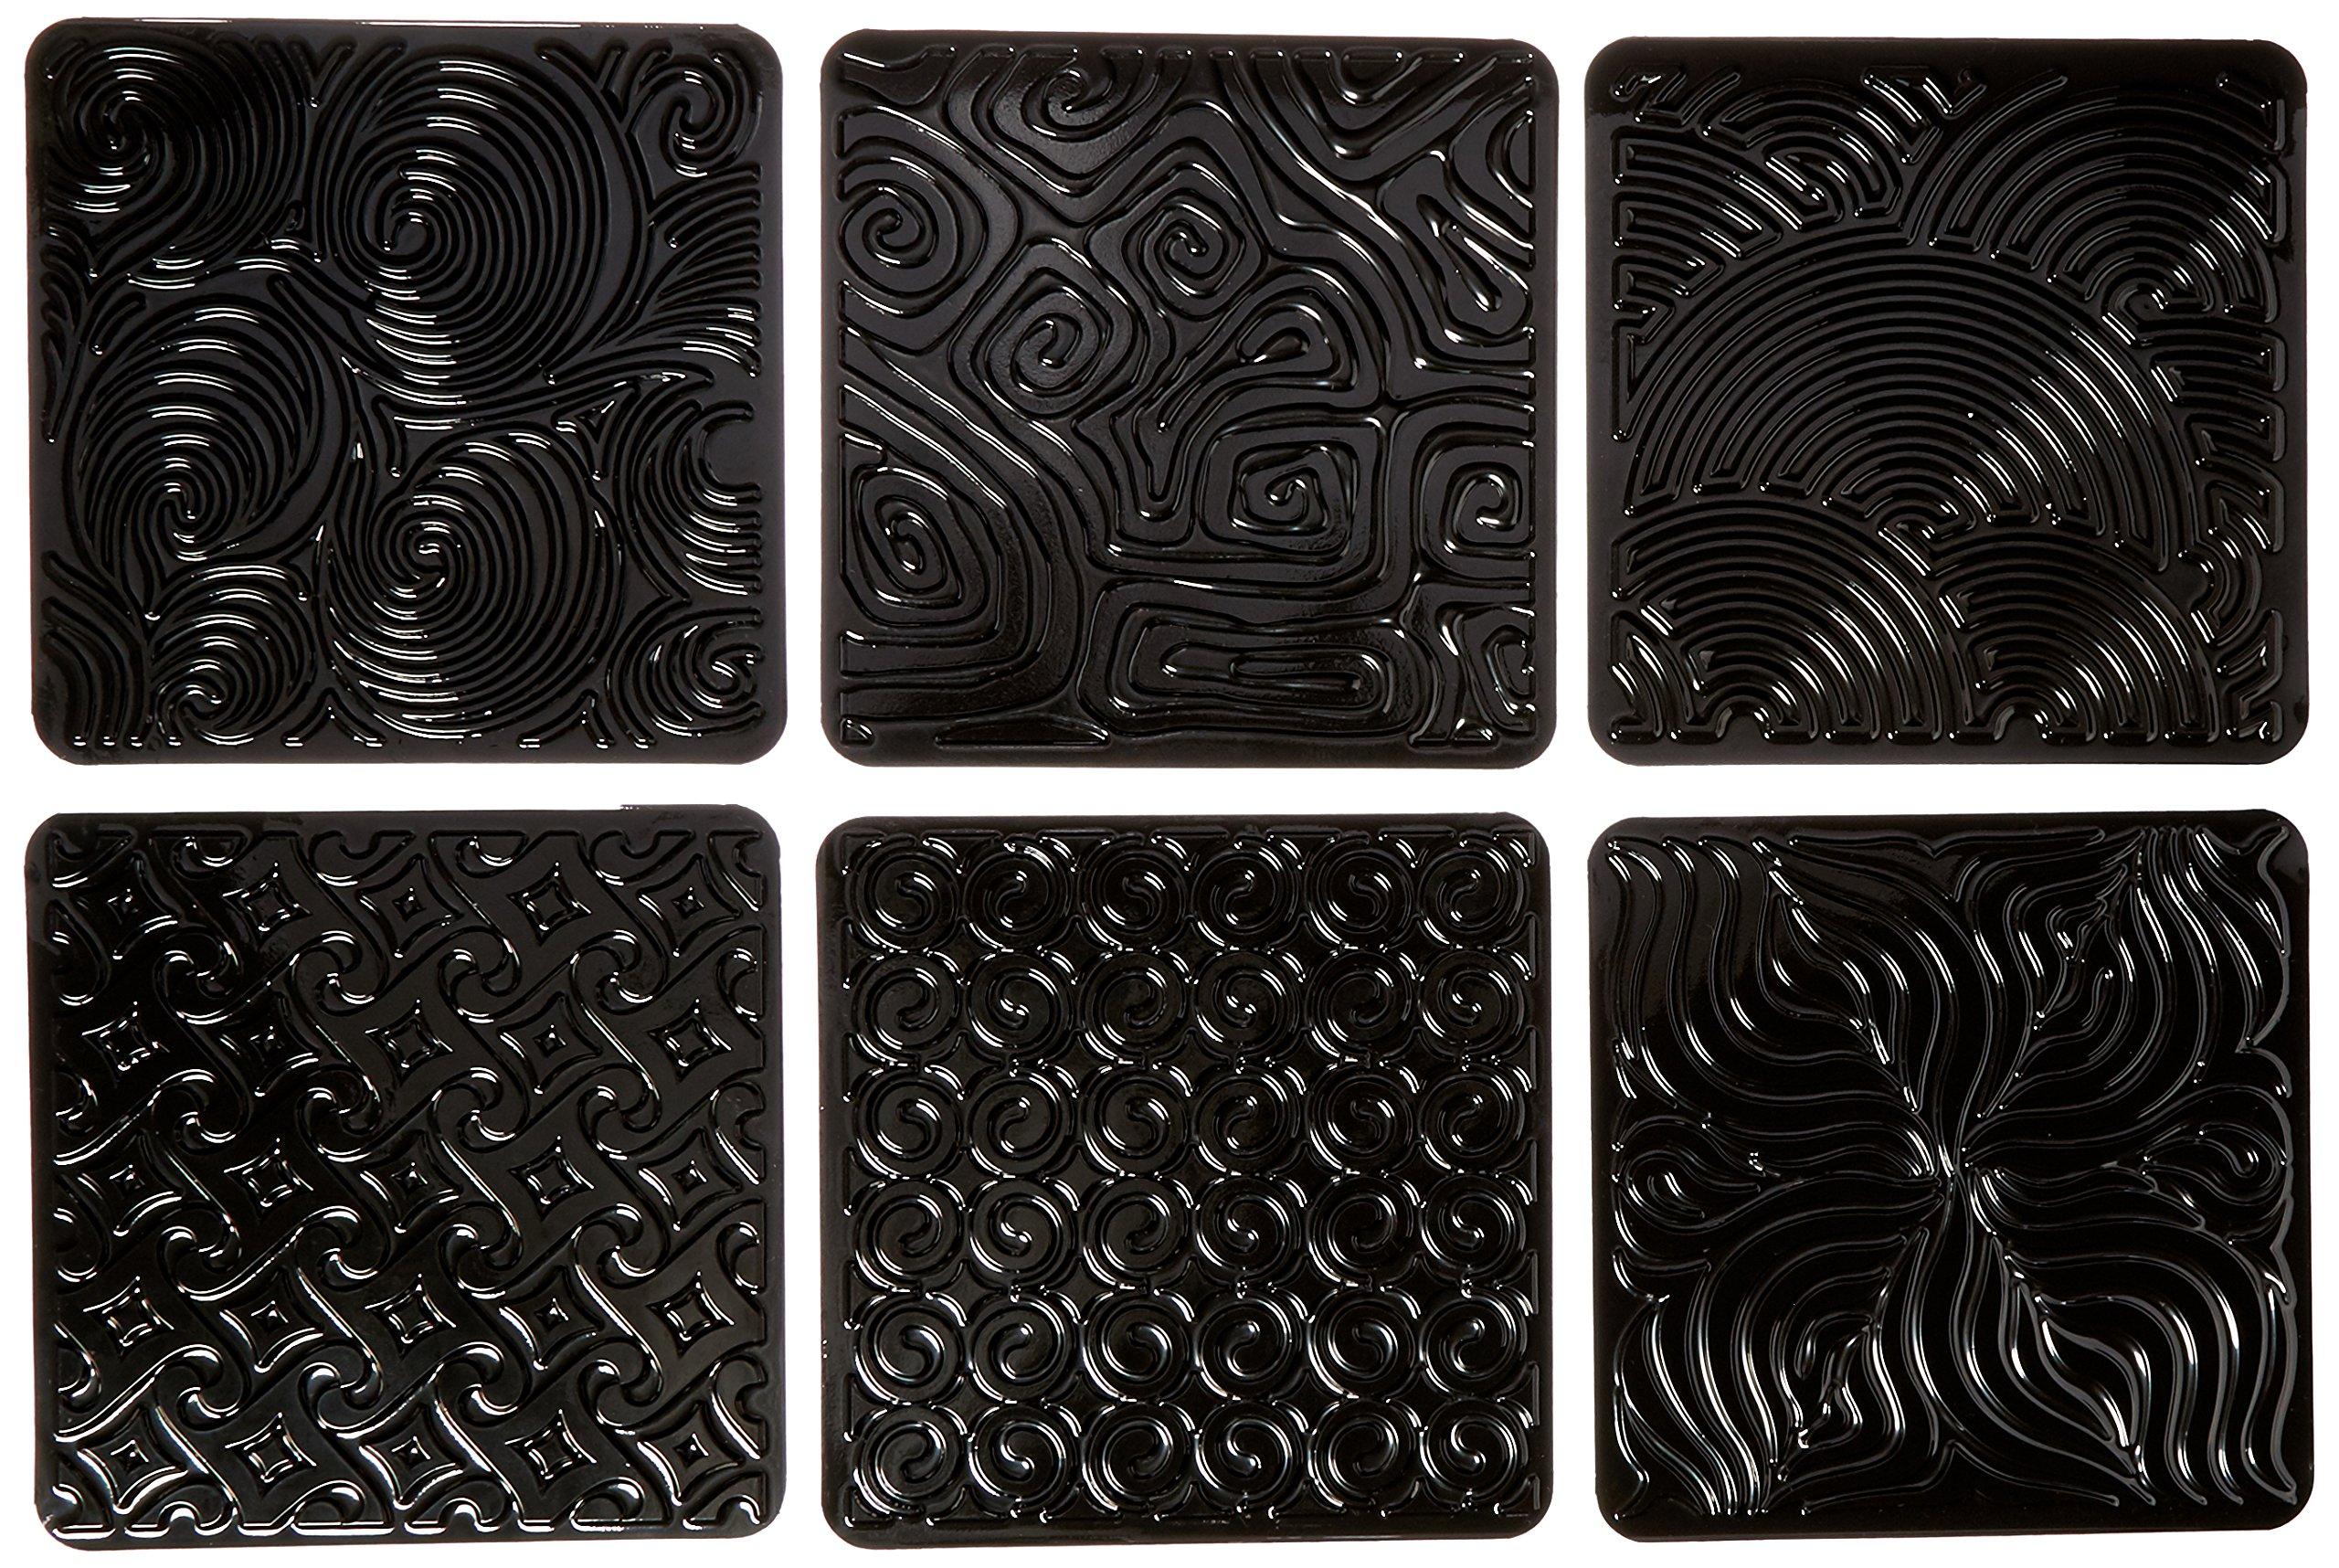 Cedar Canyon Jack Richeson Artist's Paint Sticks Rubbing Plates, 6-Pack by Cedar Canyon